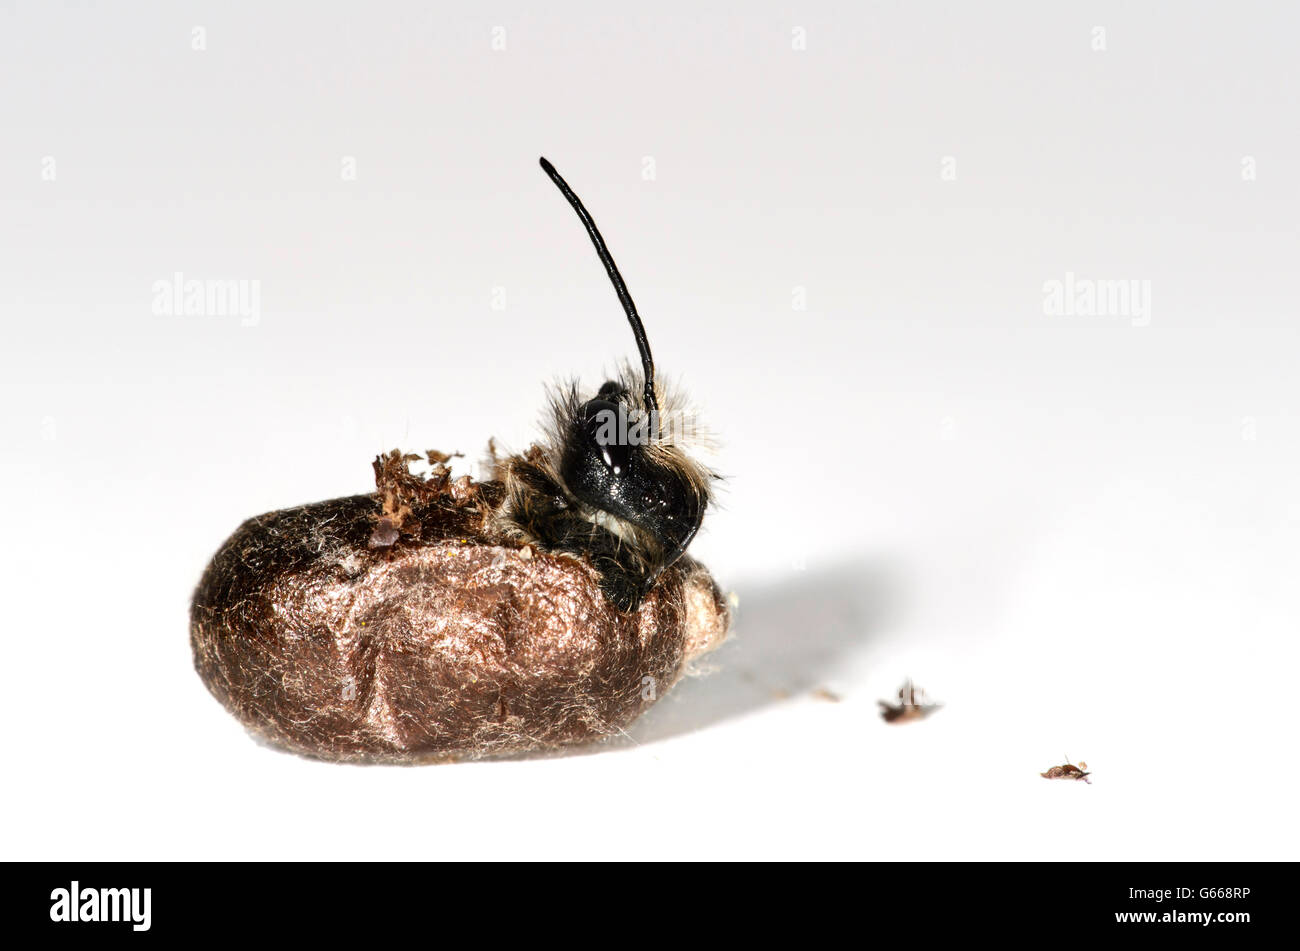 Red mason bee (Osmia bicornis) hatching, fully developed bee biting through cocoon, Switzerland - Stock Image